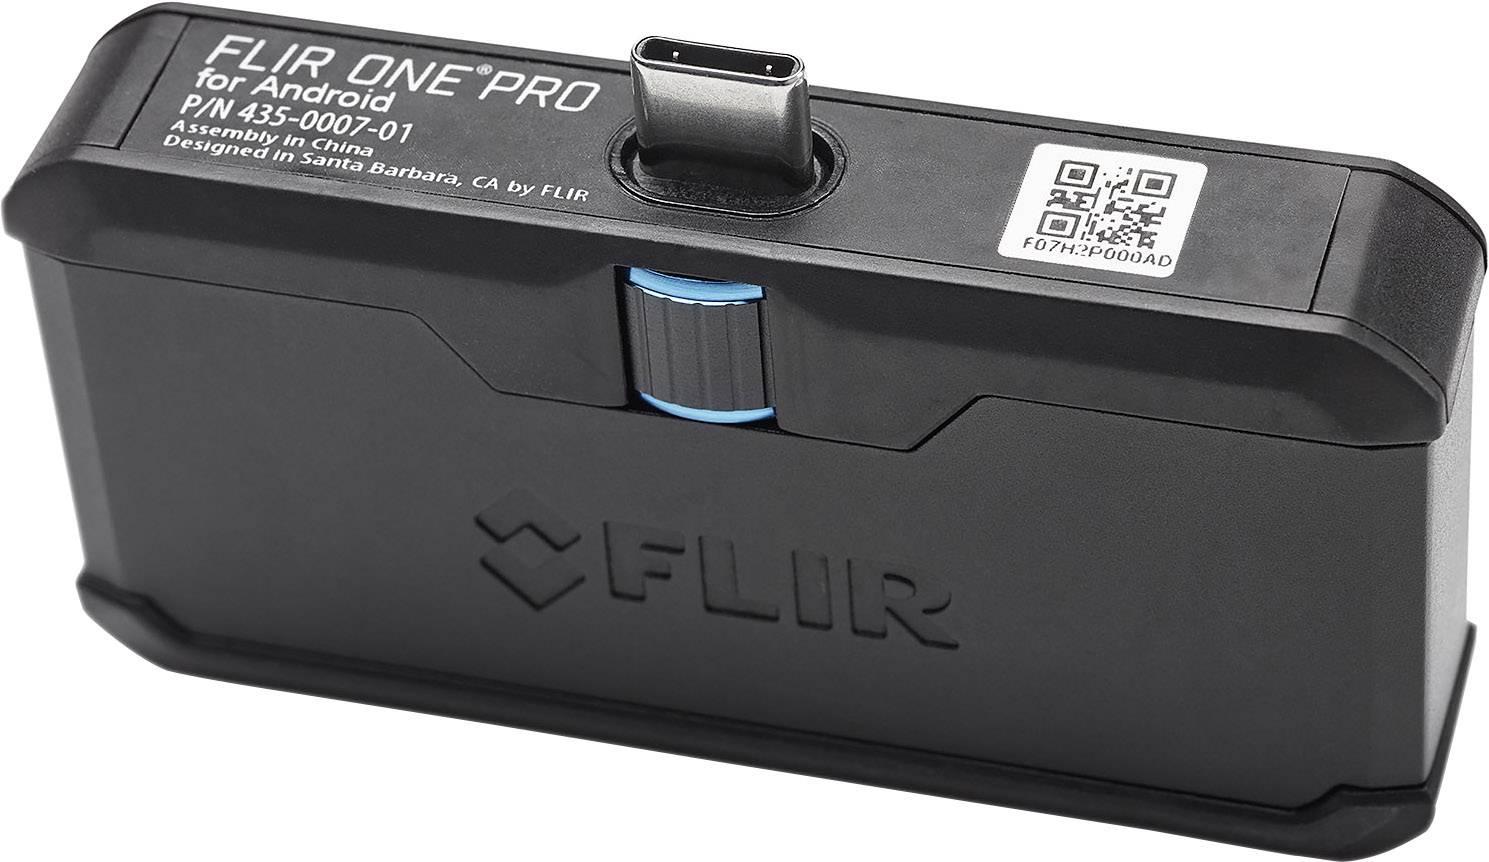 Termokamera FLIR ONE PRO Android USB C 435-0007-03-SP, 160 x 120 pix